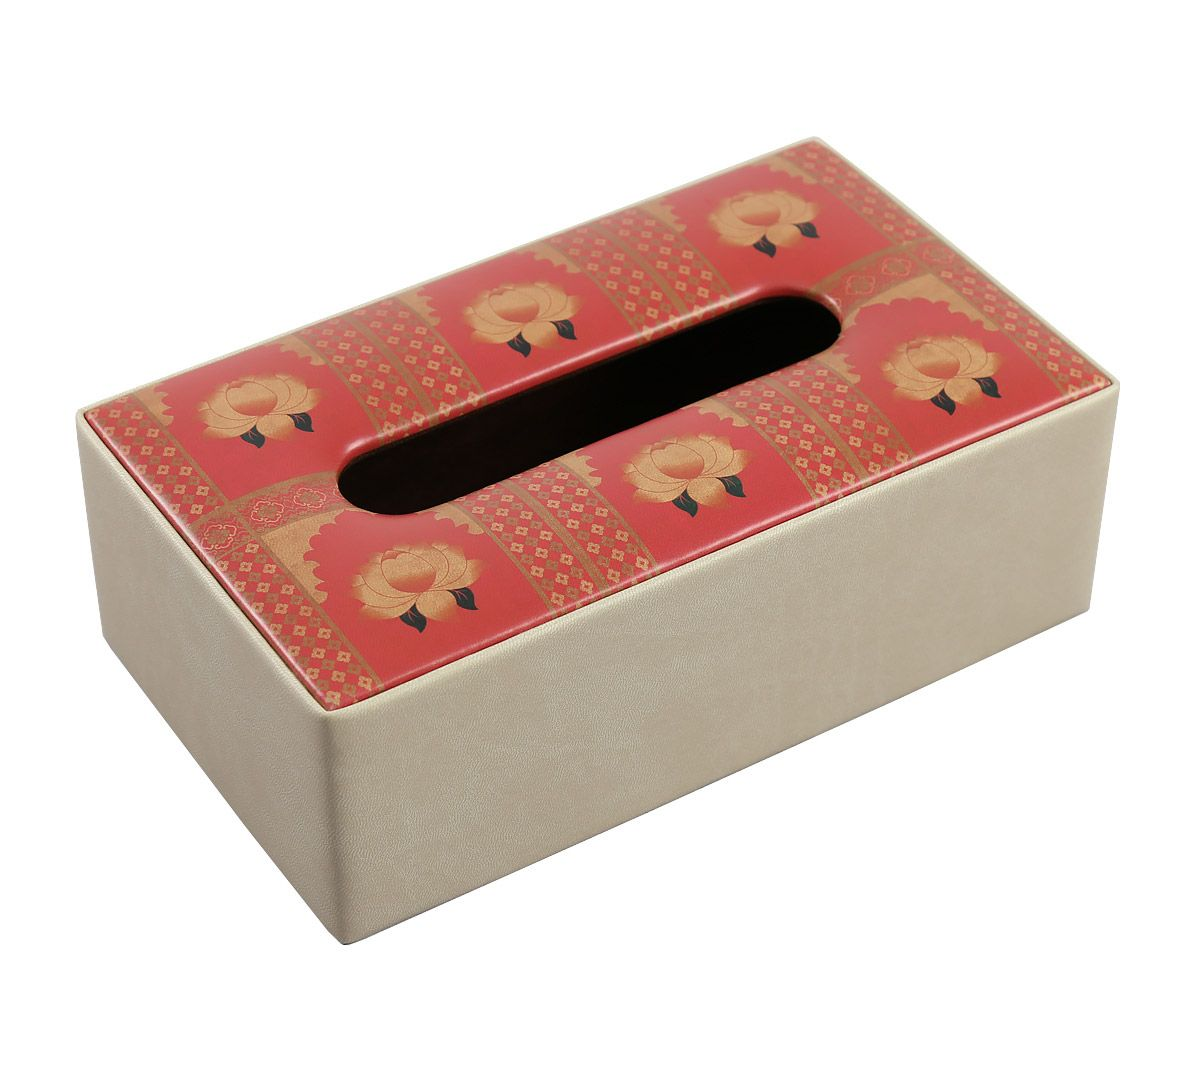 India Circus Lotus Darbar Leather Tissue Box Holder